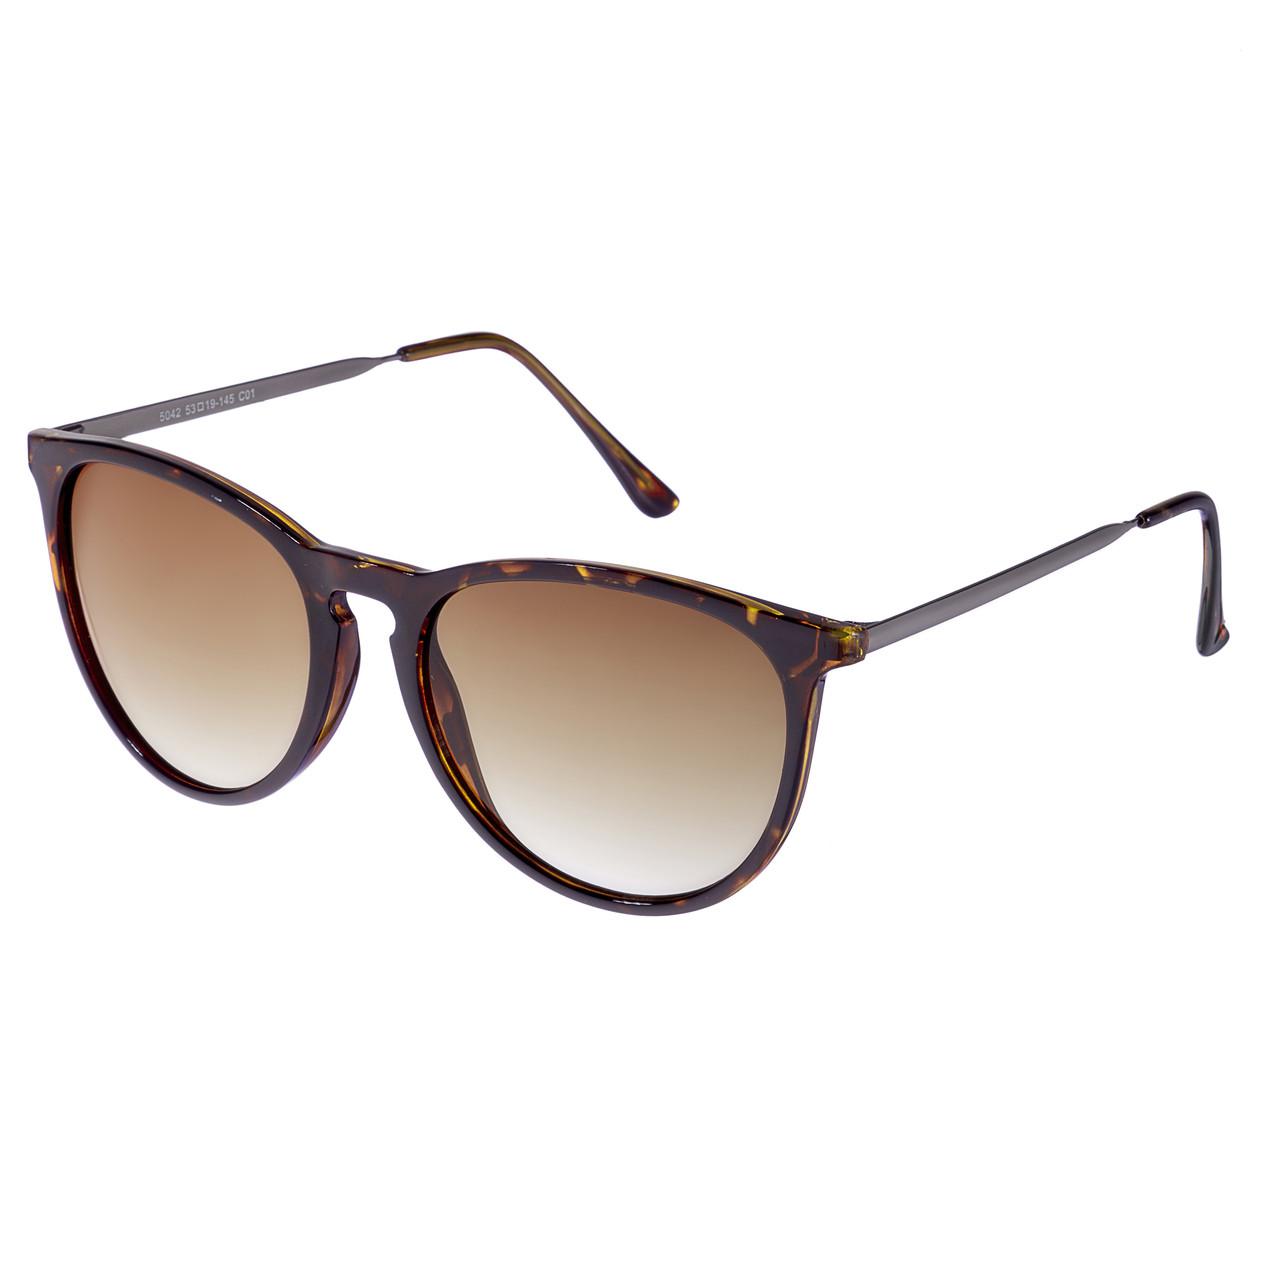 b464bd21b2 Stylle Keyhole Bridge Round Sunglasses - Styllize